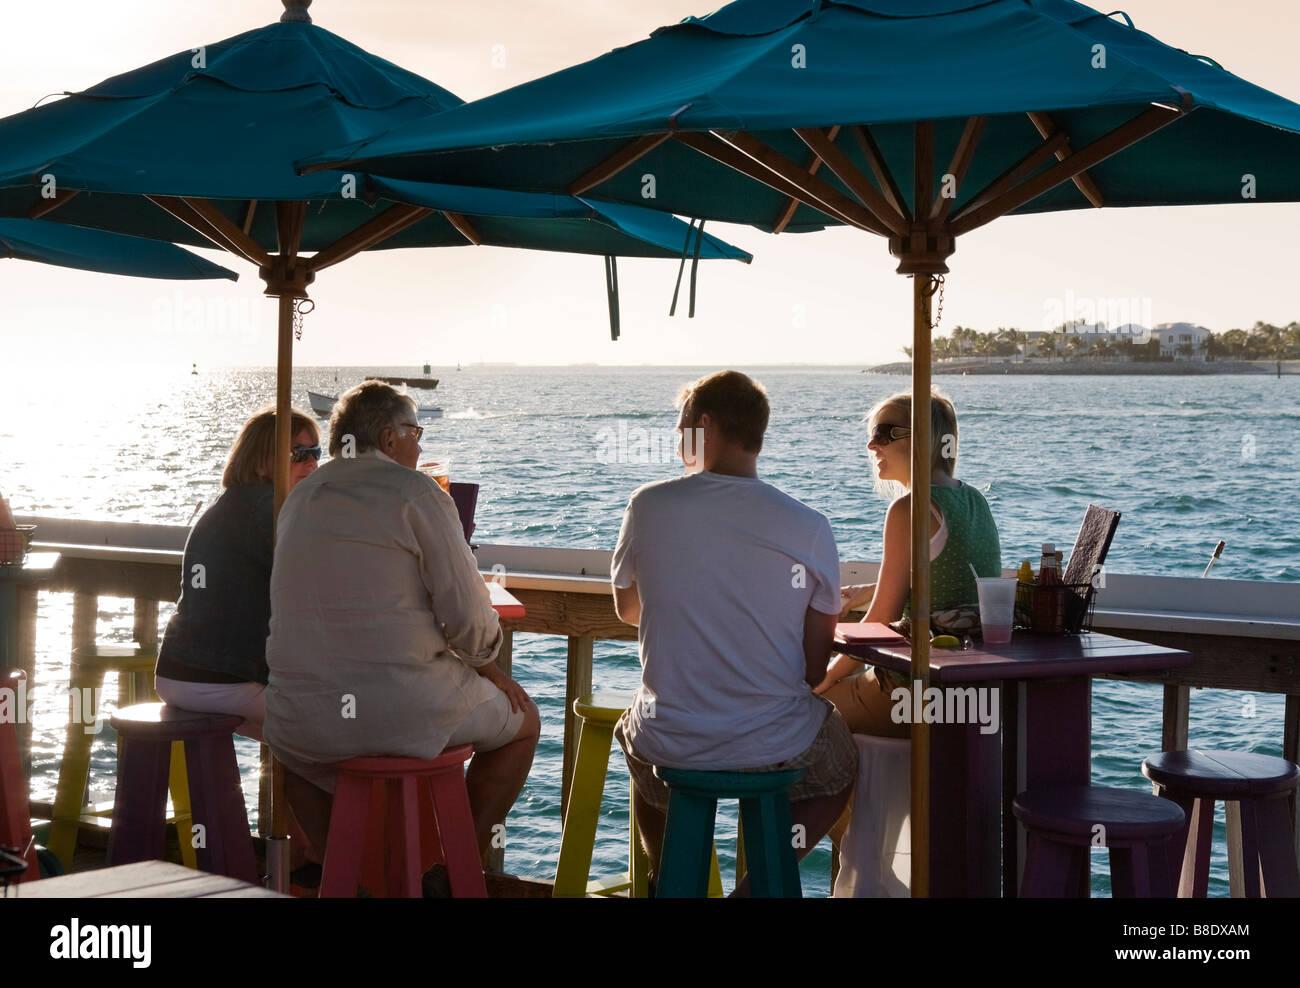 Sunset Pier bar and restaurant just before sunset, Ocean Key Resort, Old Town, Key West, Florida Keys, USA - Stock Image